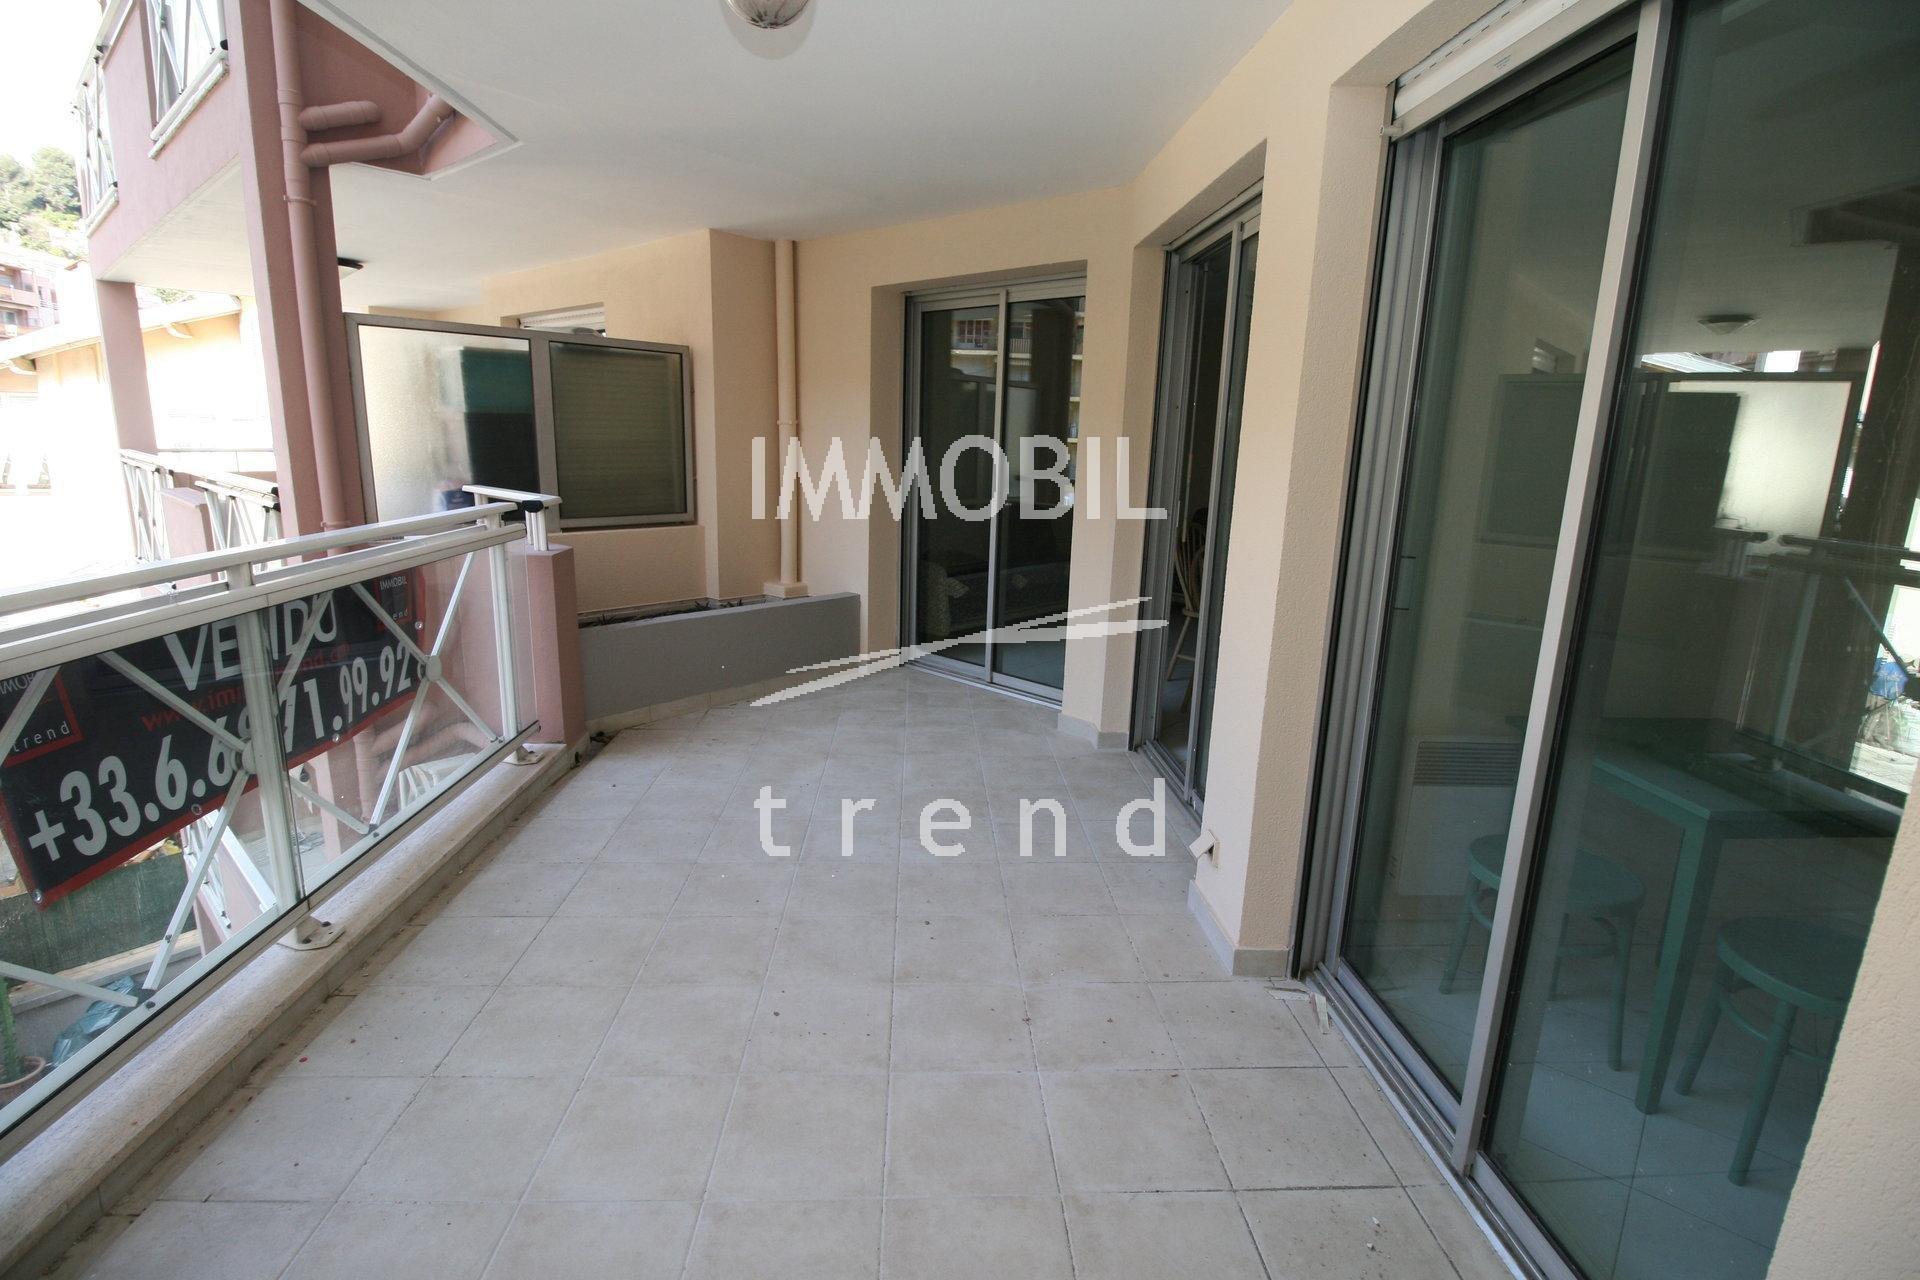 EXCLUSIVITE-Menton residence standing, appartement de 52 m2, terrasse, avec cave